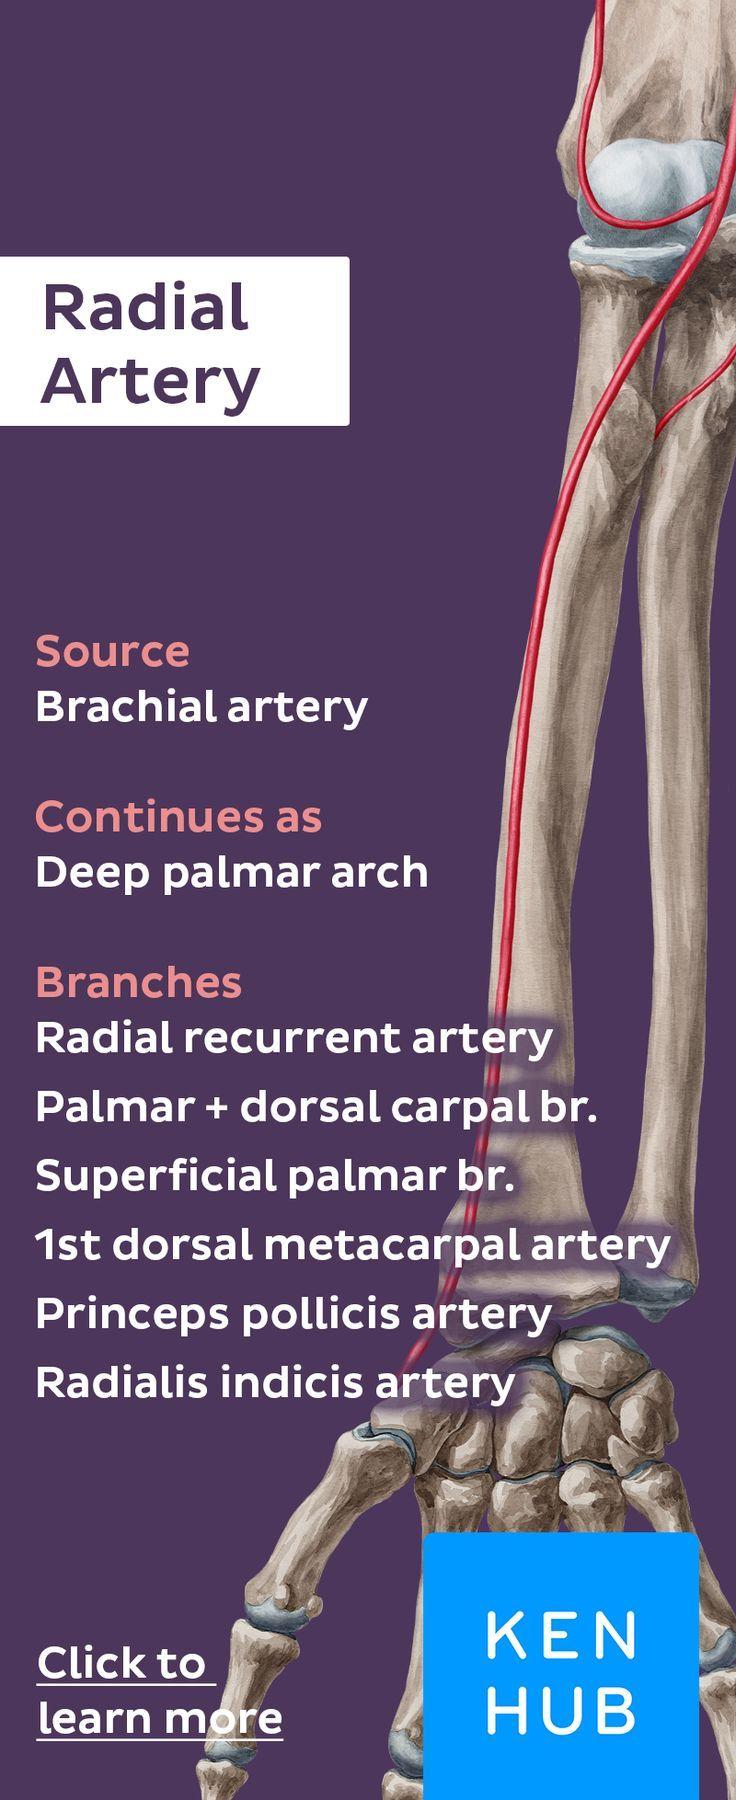 Radial Artery Medical Pinterest Anatomy And Alternative Medicine